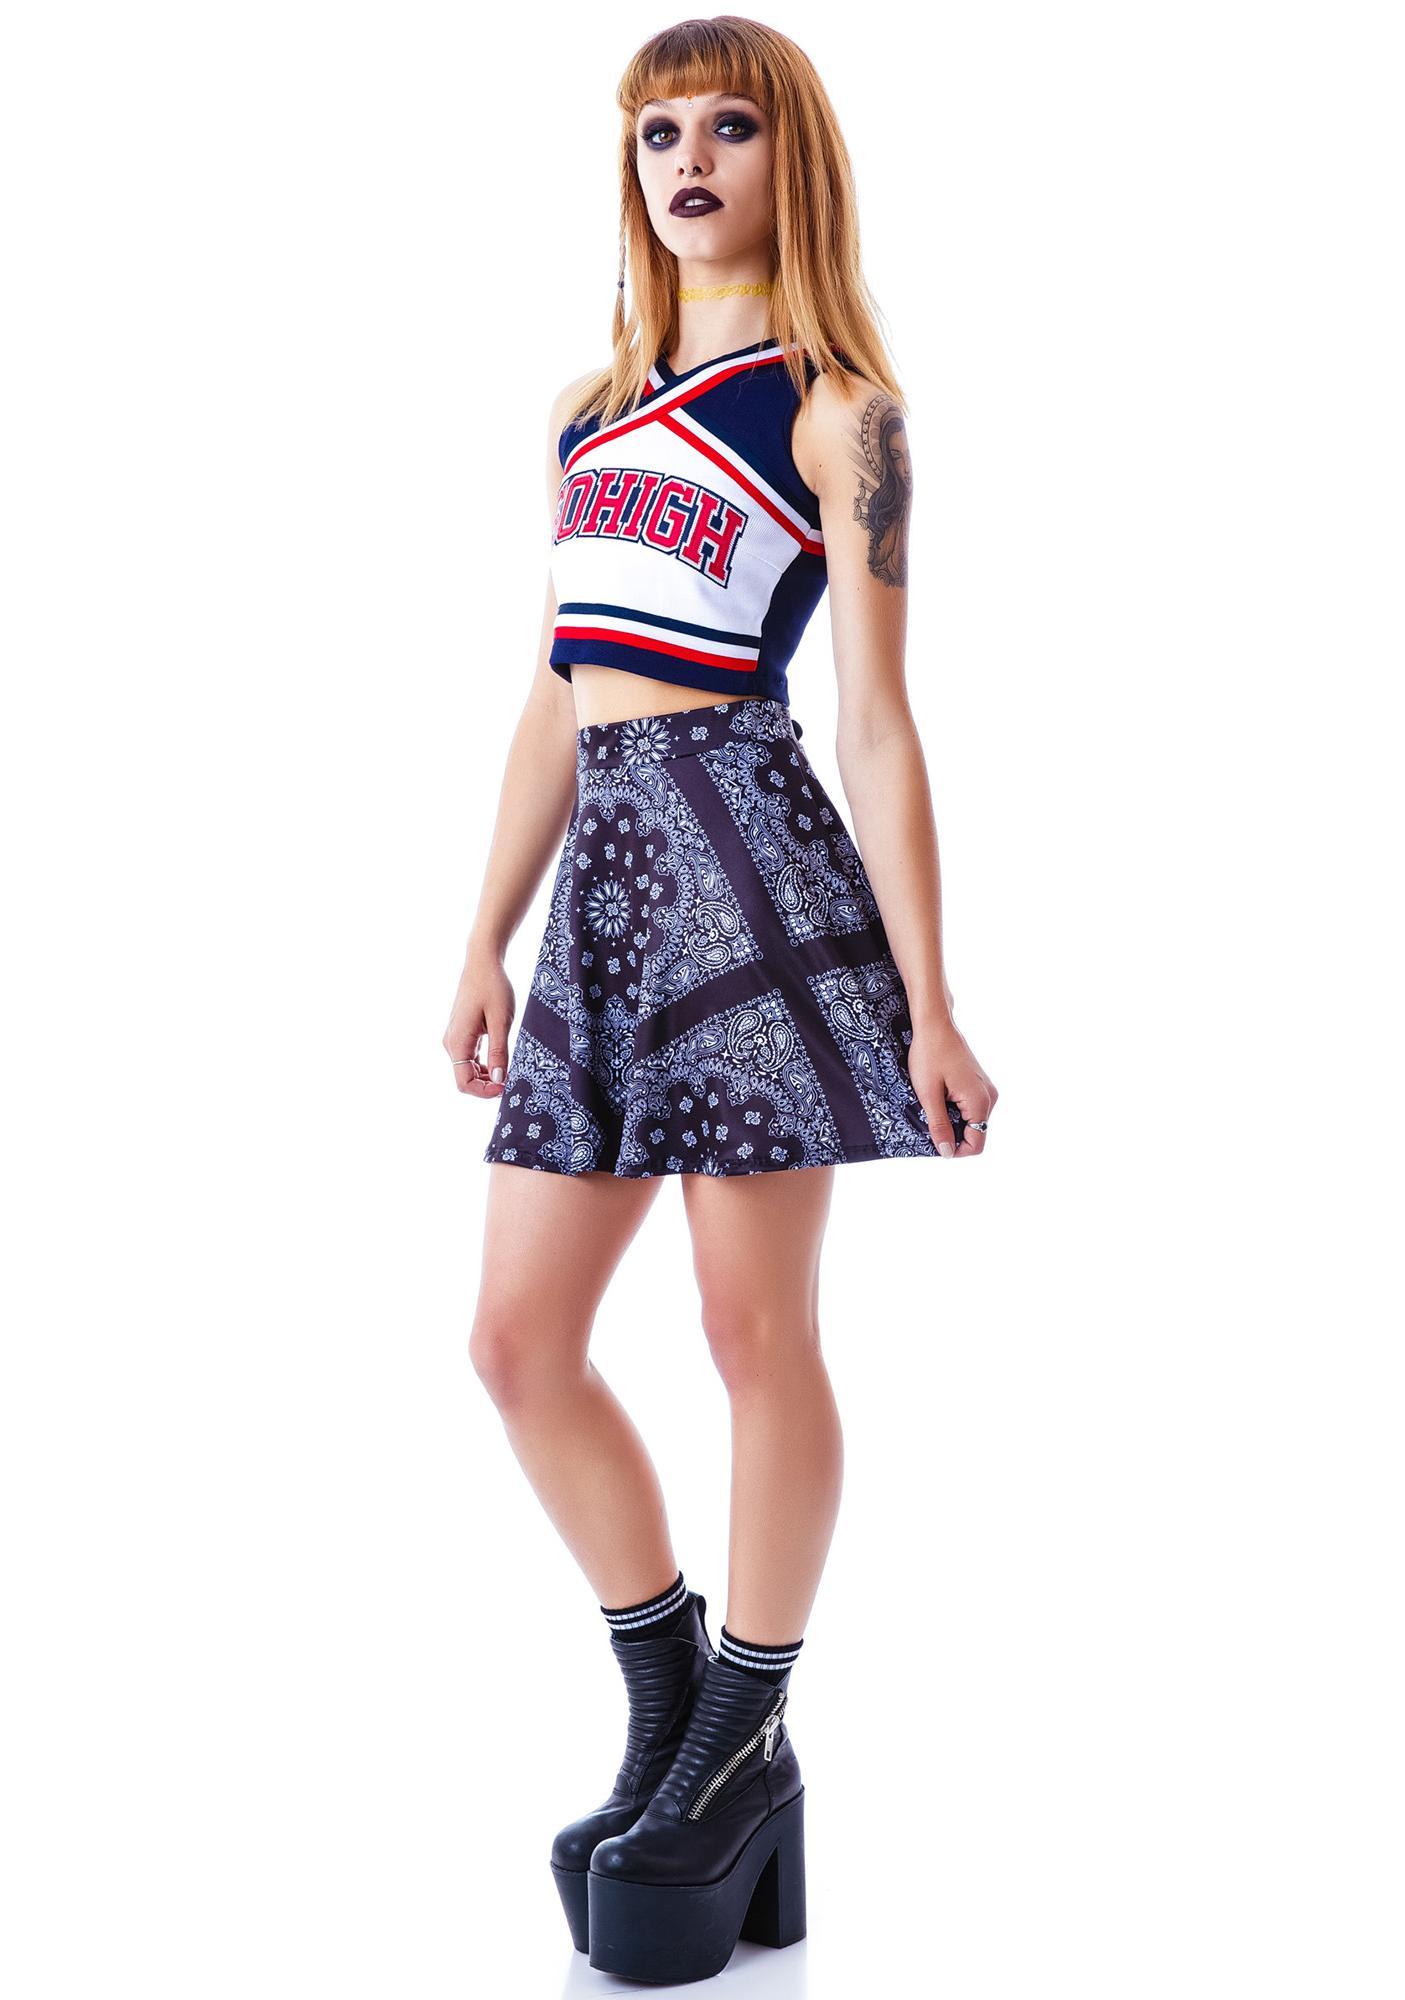 Yeehaw Bandana Skater Skirt